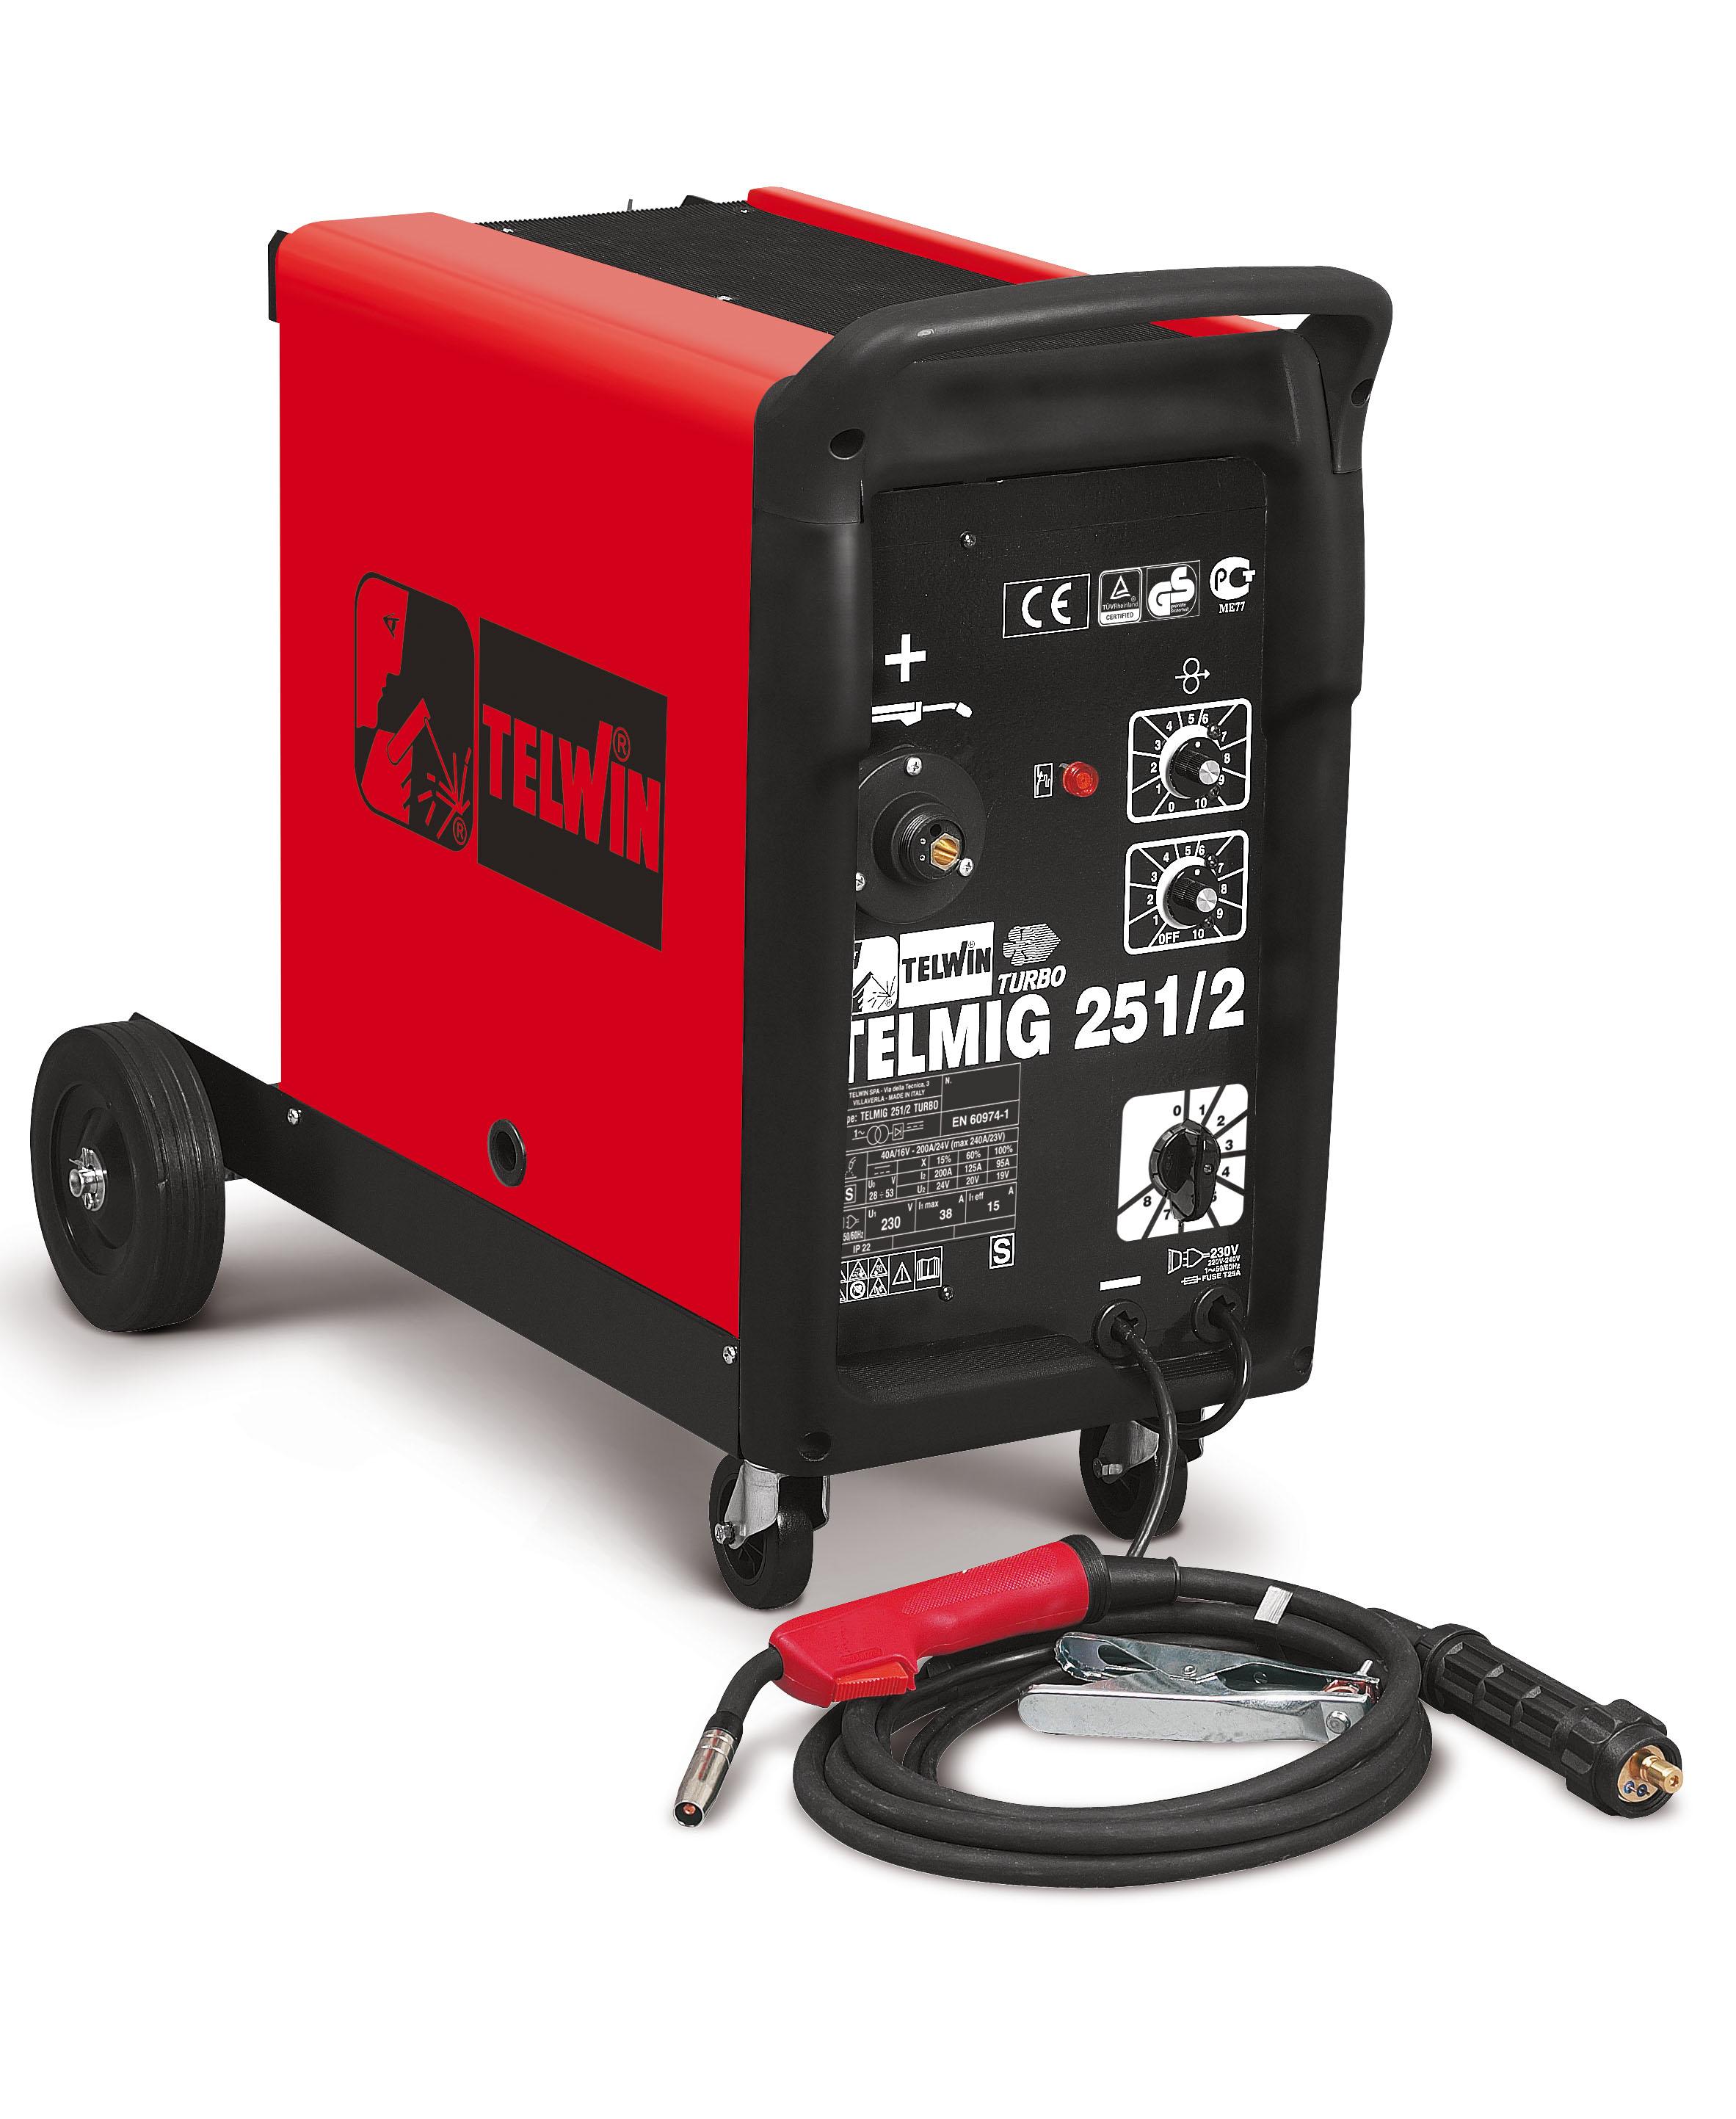 TELWIN 821070 - TELMIG 251/2 TURBO 230V, MIG-MAG welding machine, P-Max(8kW)